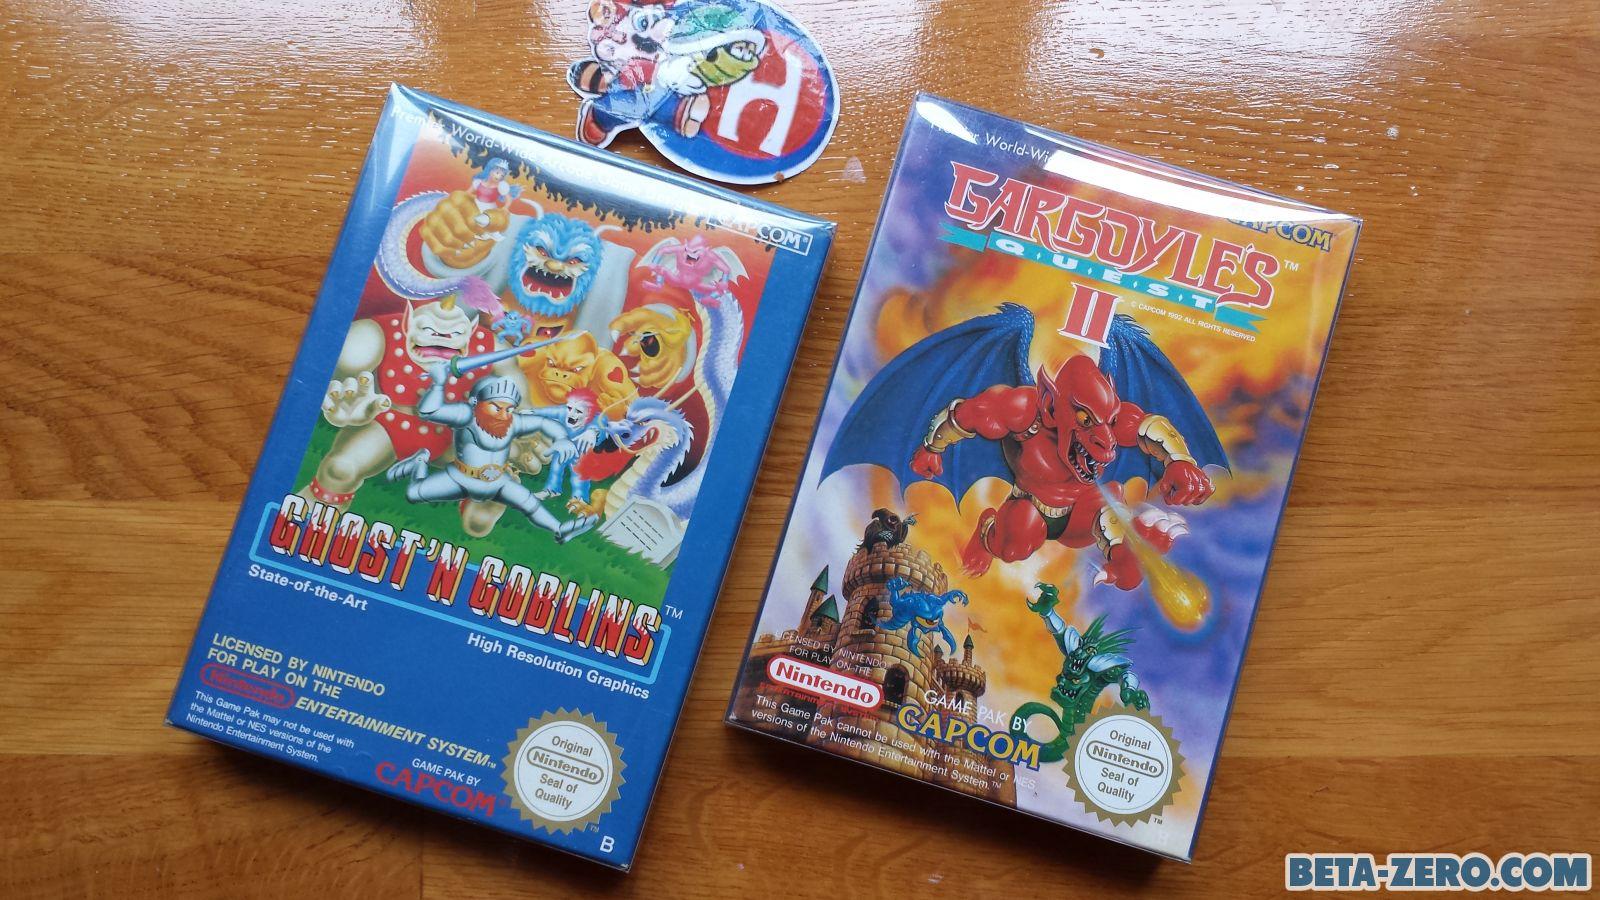 Ghost 'N Goblins & Gargoyle's Quest II